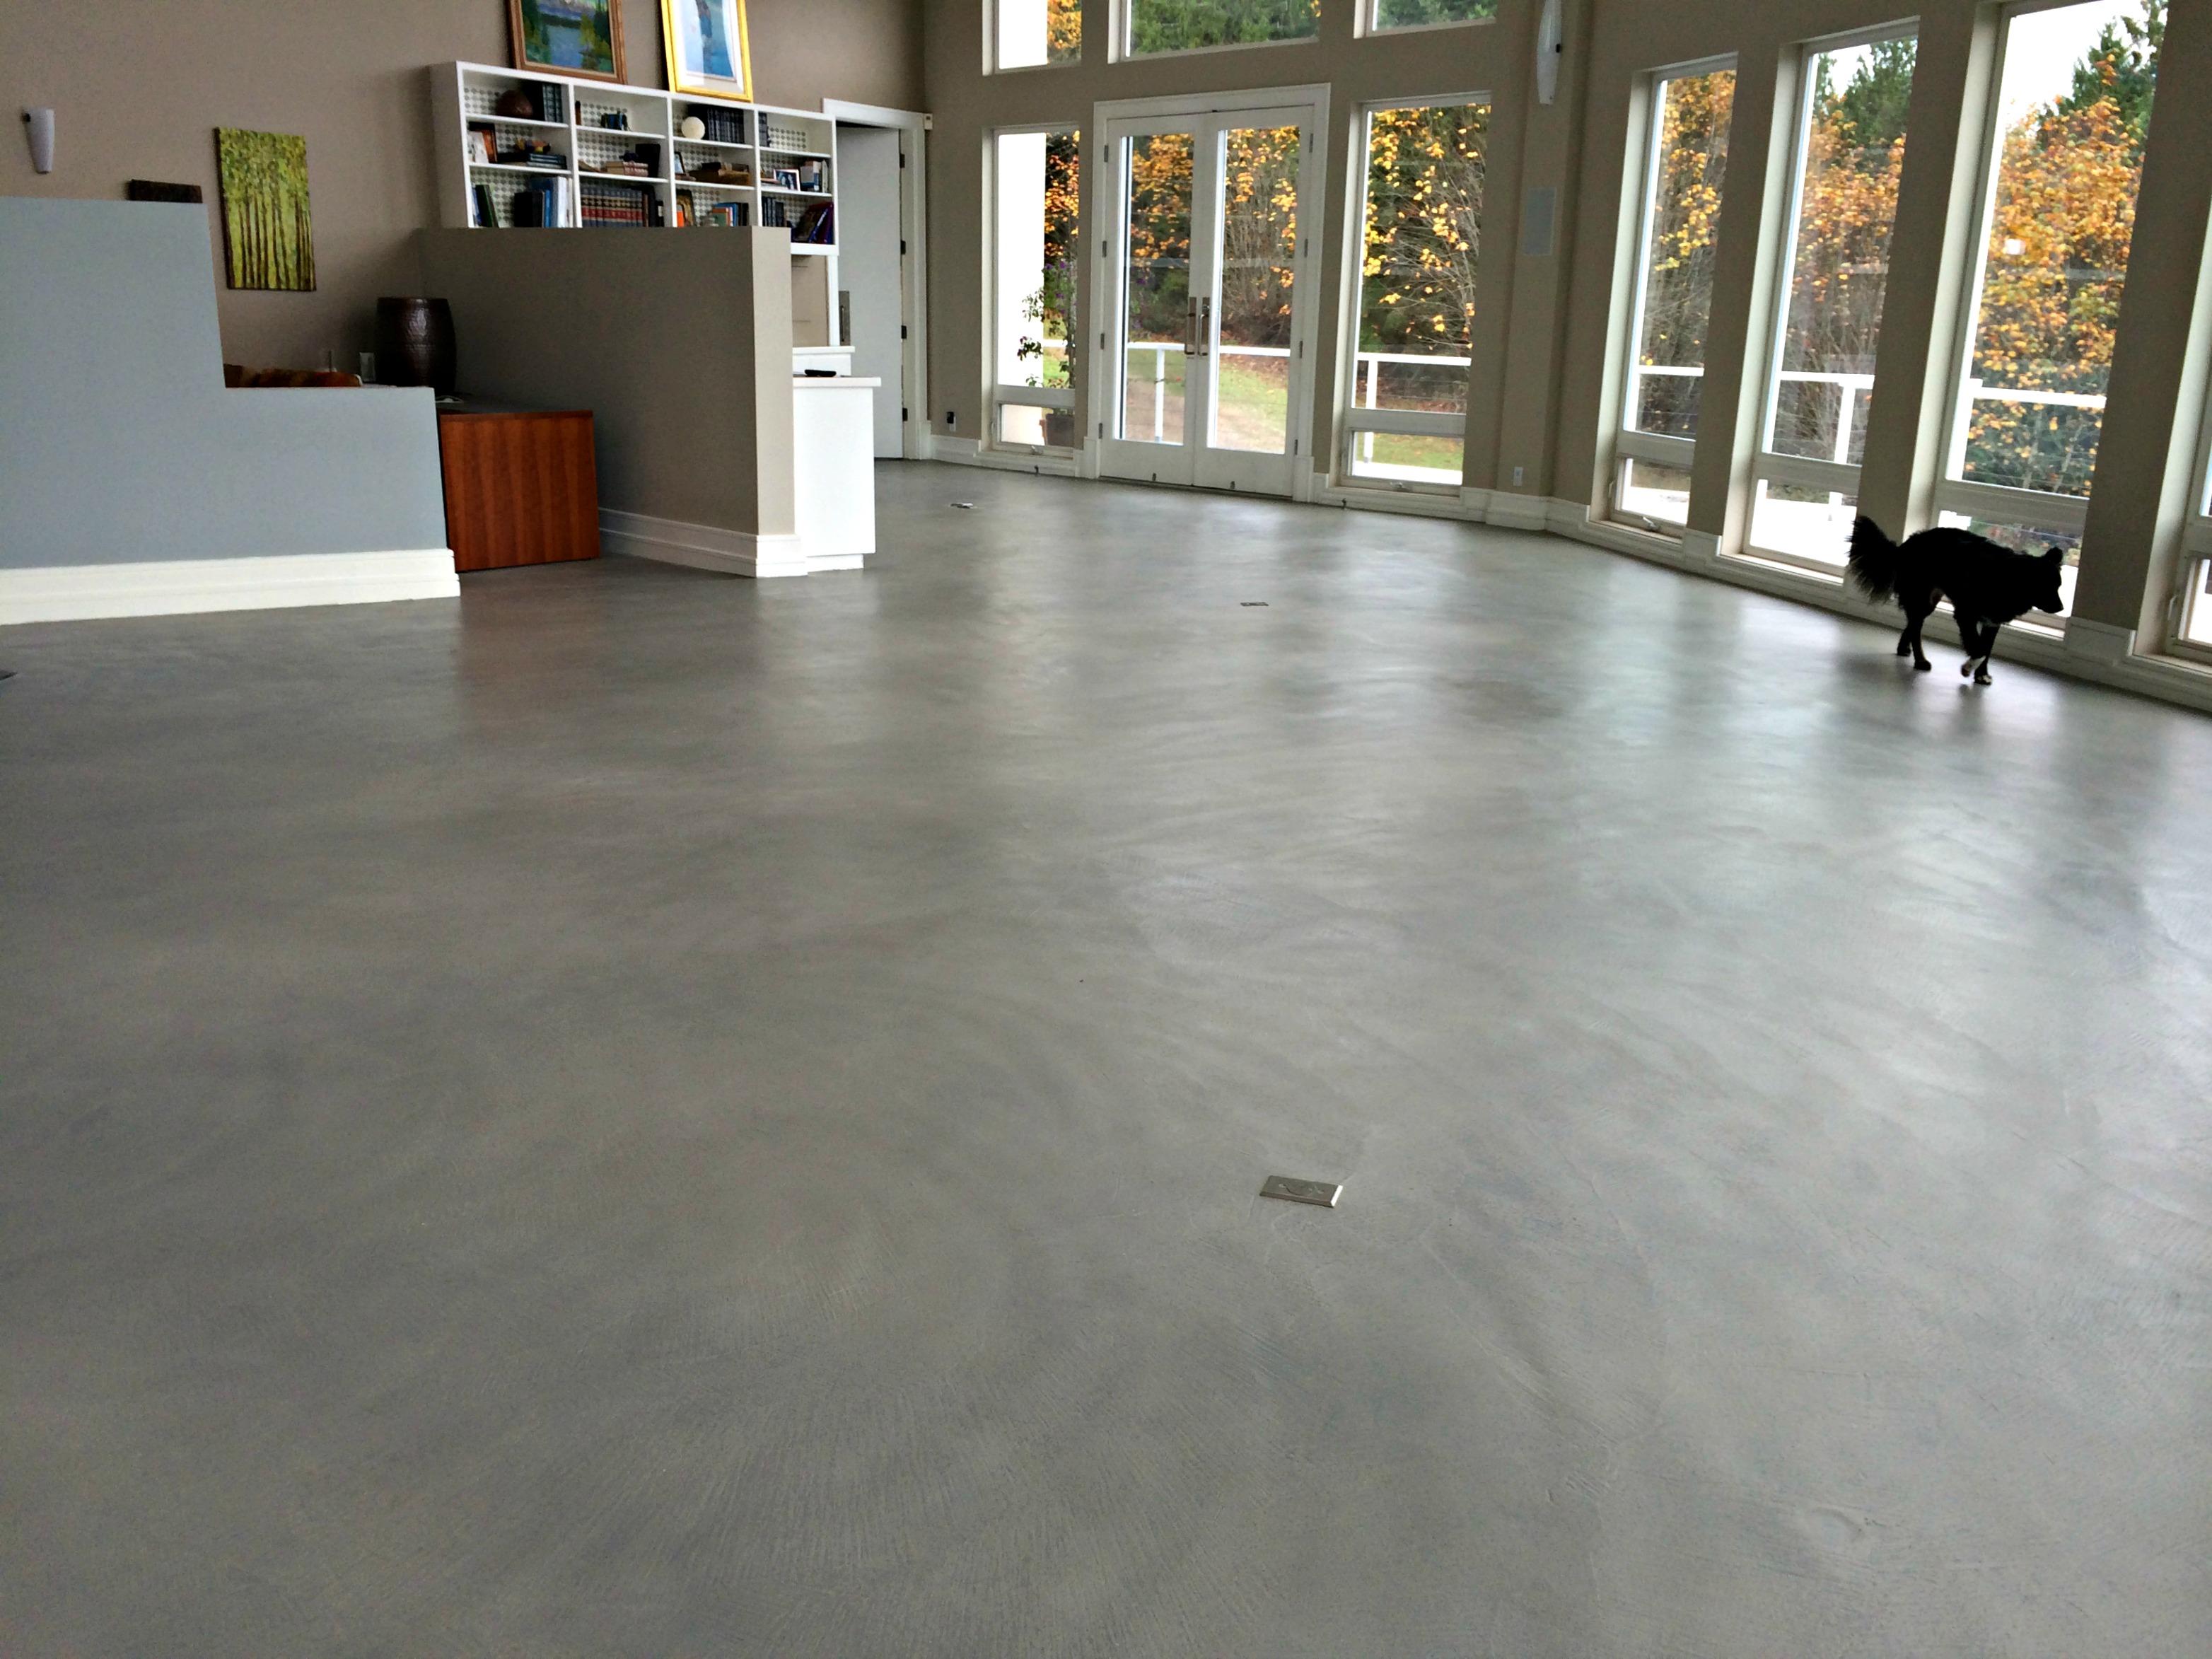 Beautiful Floors flooring | big white house on the hill